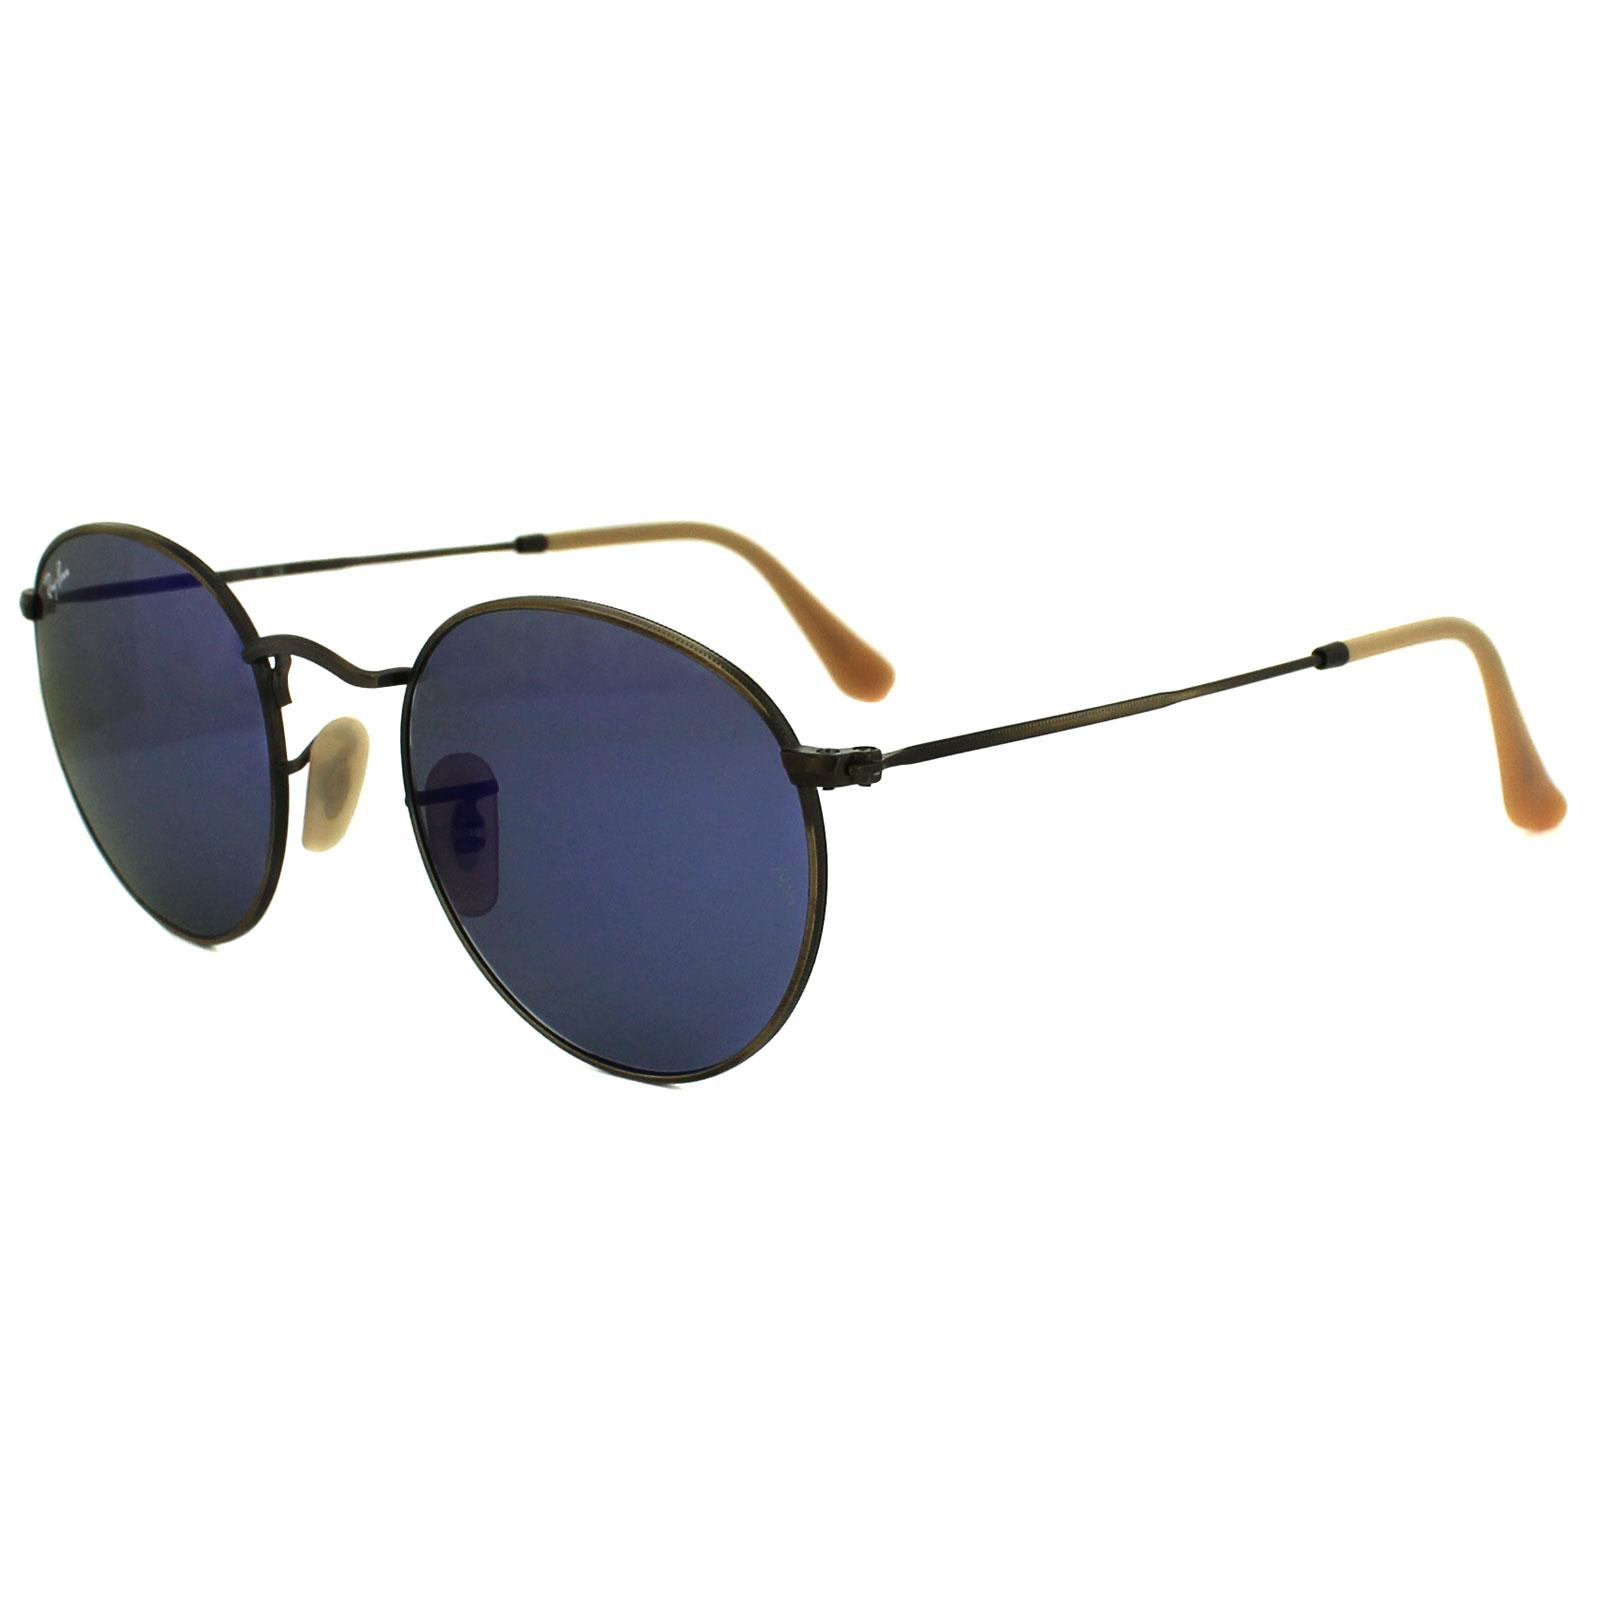 e8711e0c9 ... norway sentinel ray ban sunglasses round metal 3447 167 68 brushed  bronze blue flash mirror m